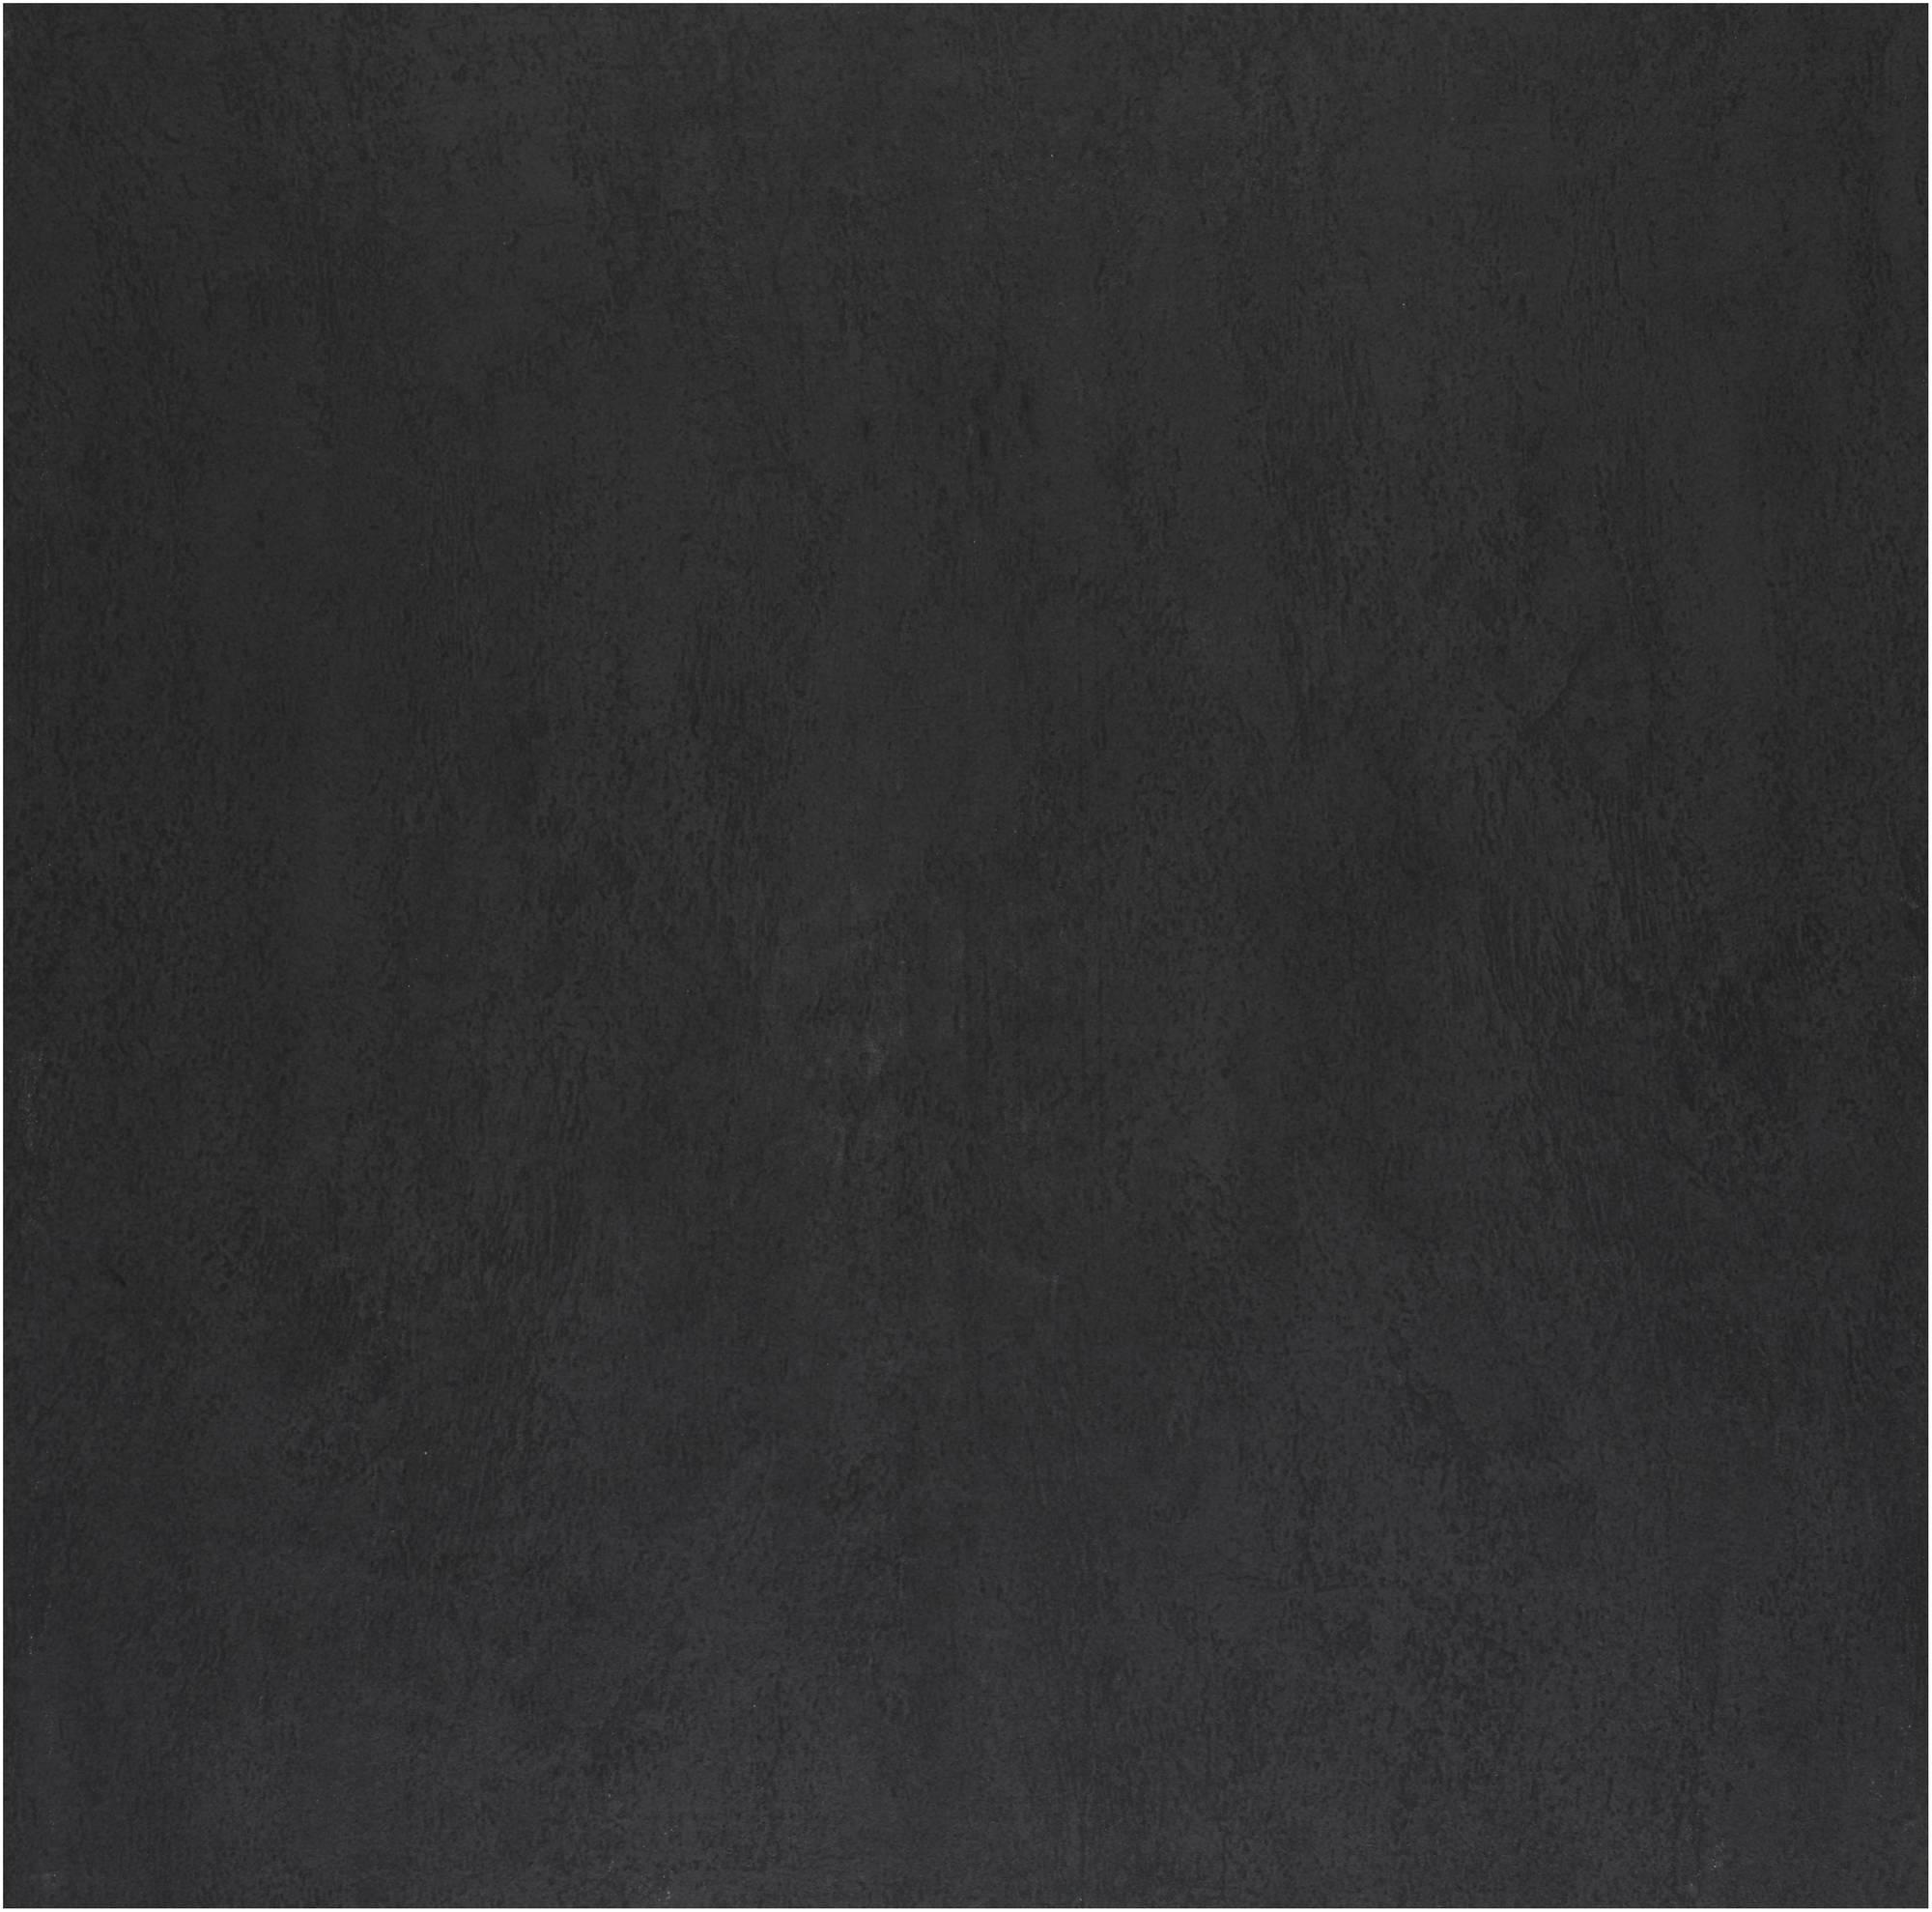 Vloertegel Imola Creative concrete 60x60x1,05 cm Zwart 1,08M2